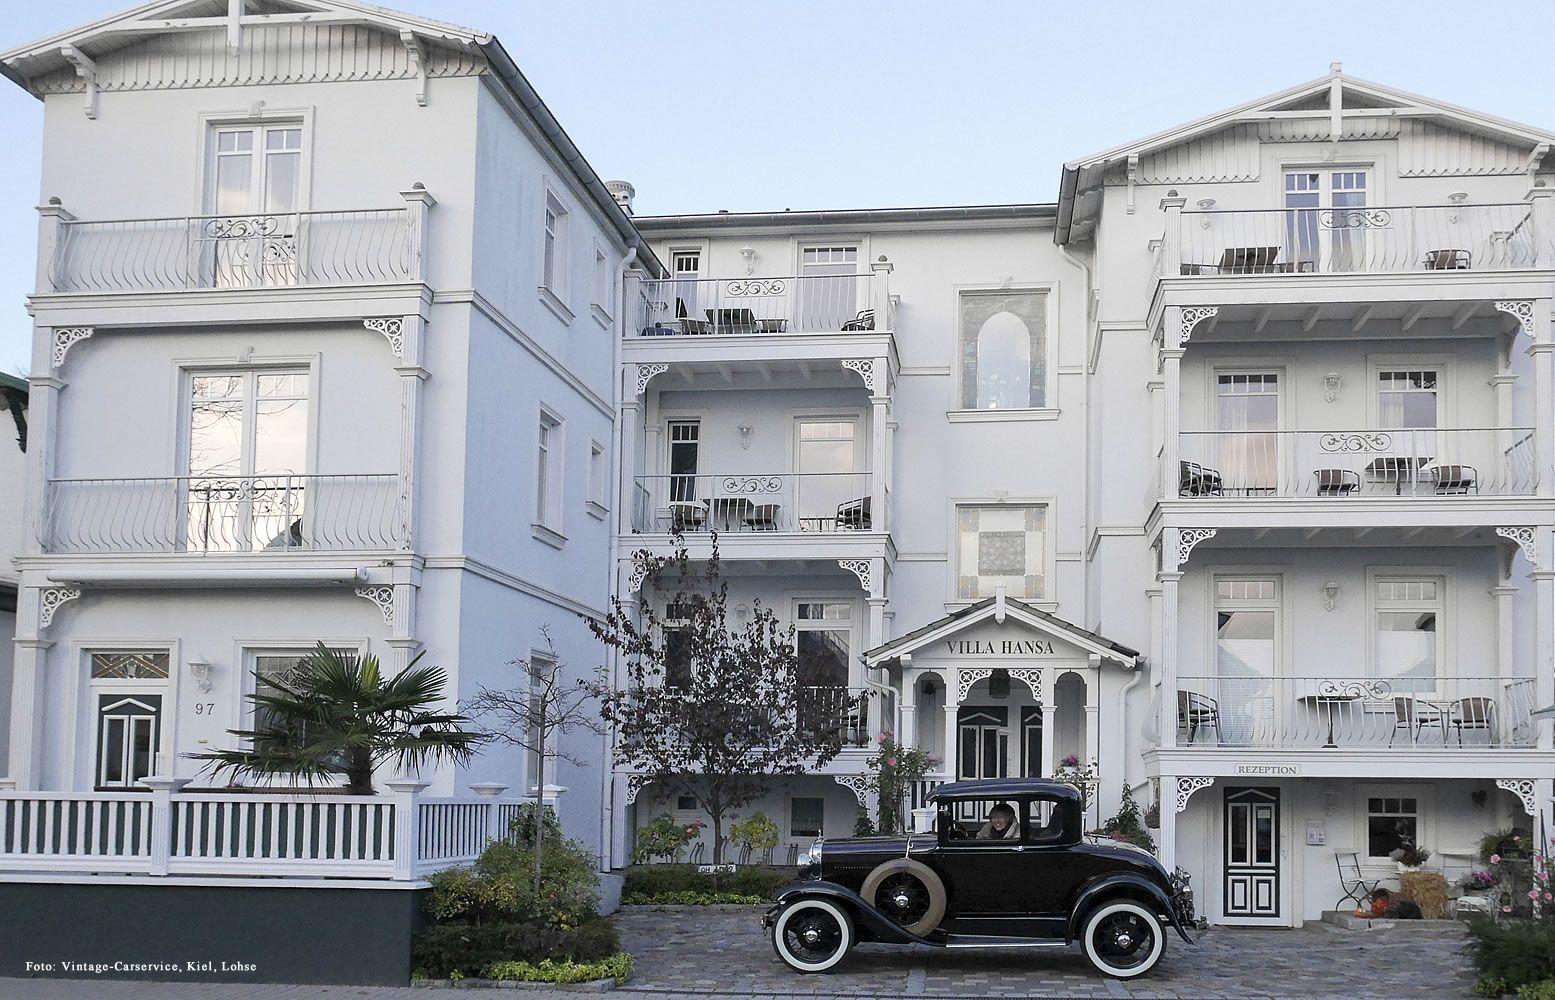 Villa Kiel ford a coupe 1930 vor villa hansa ein foto vom vintage